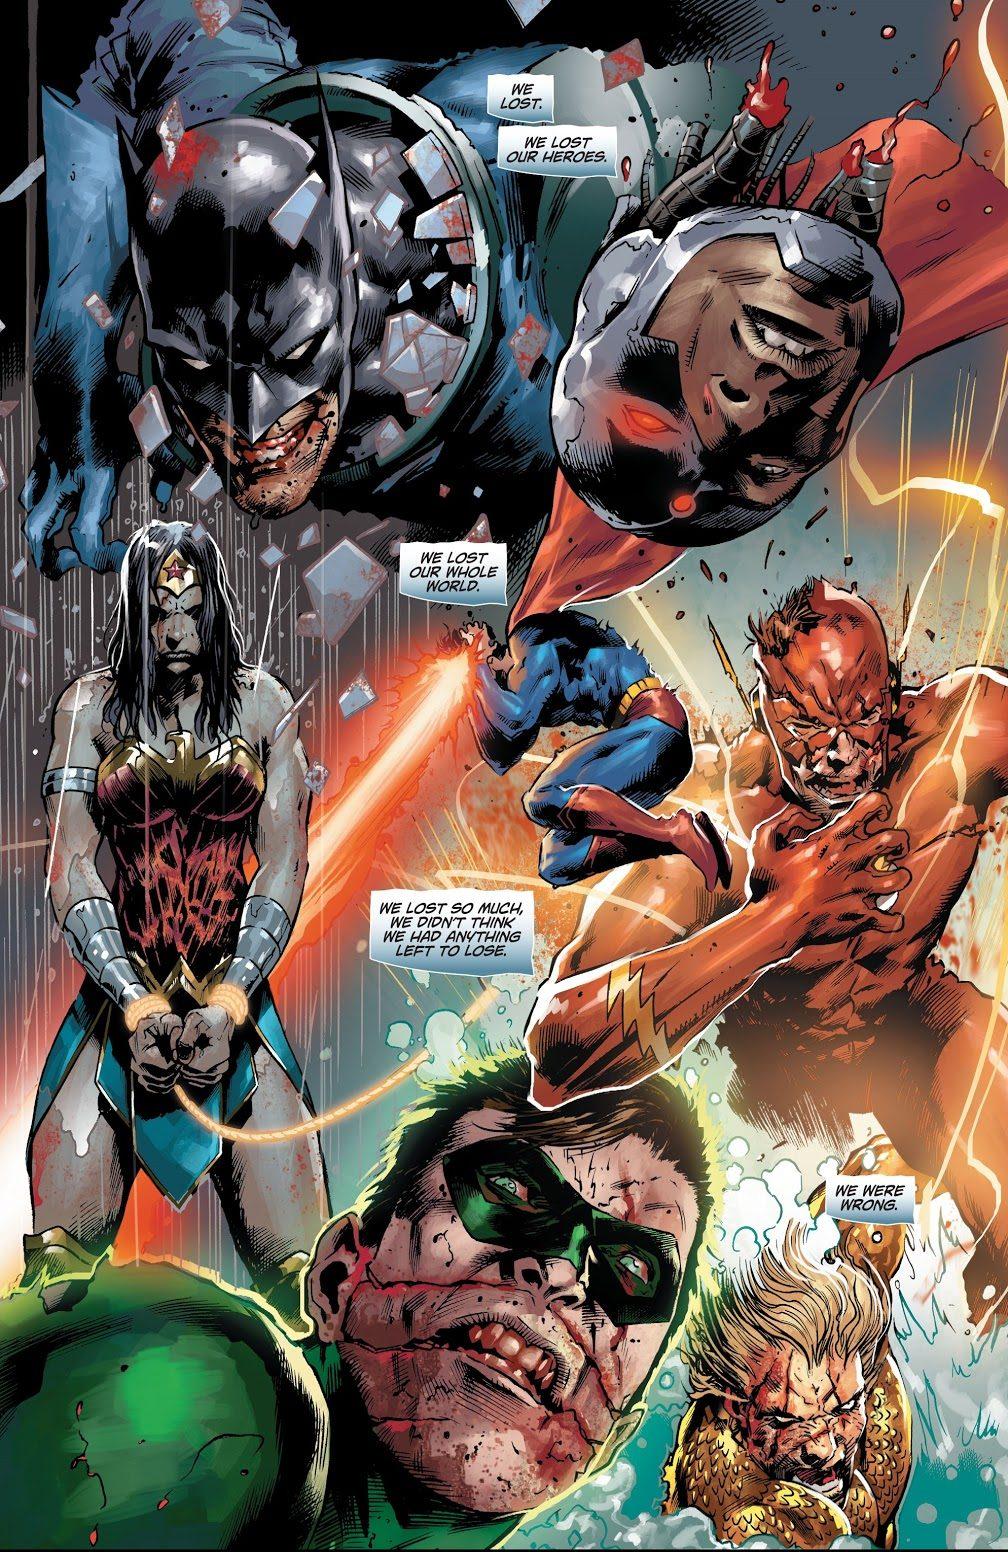 Justice League (DCeased: Dead Planet #1)